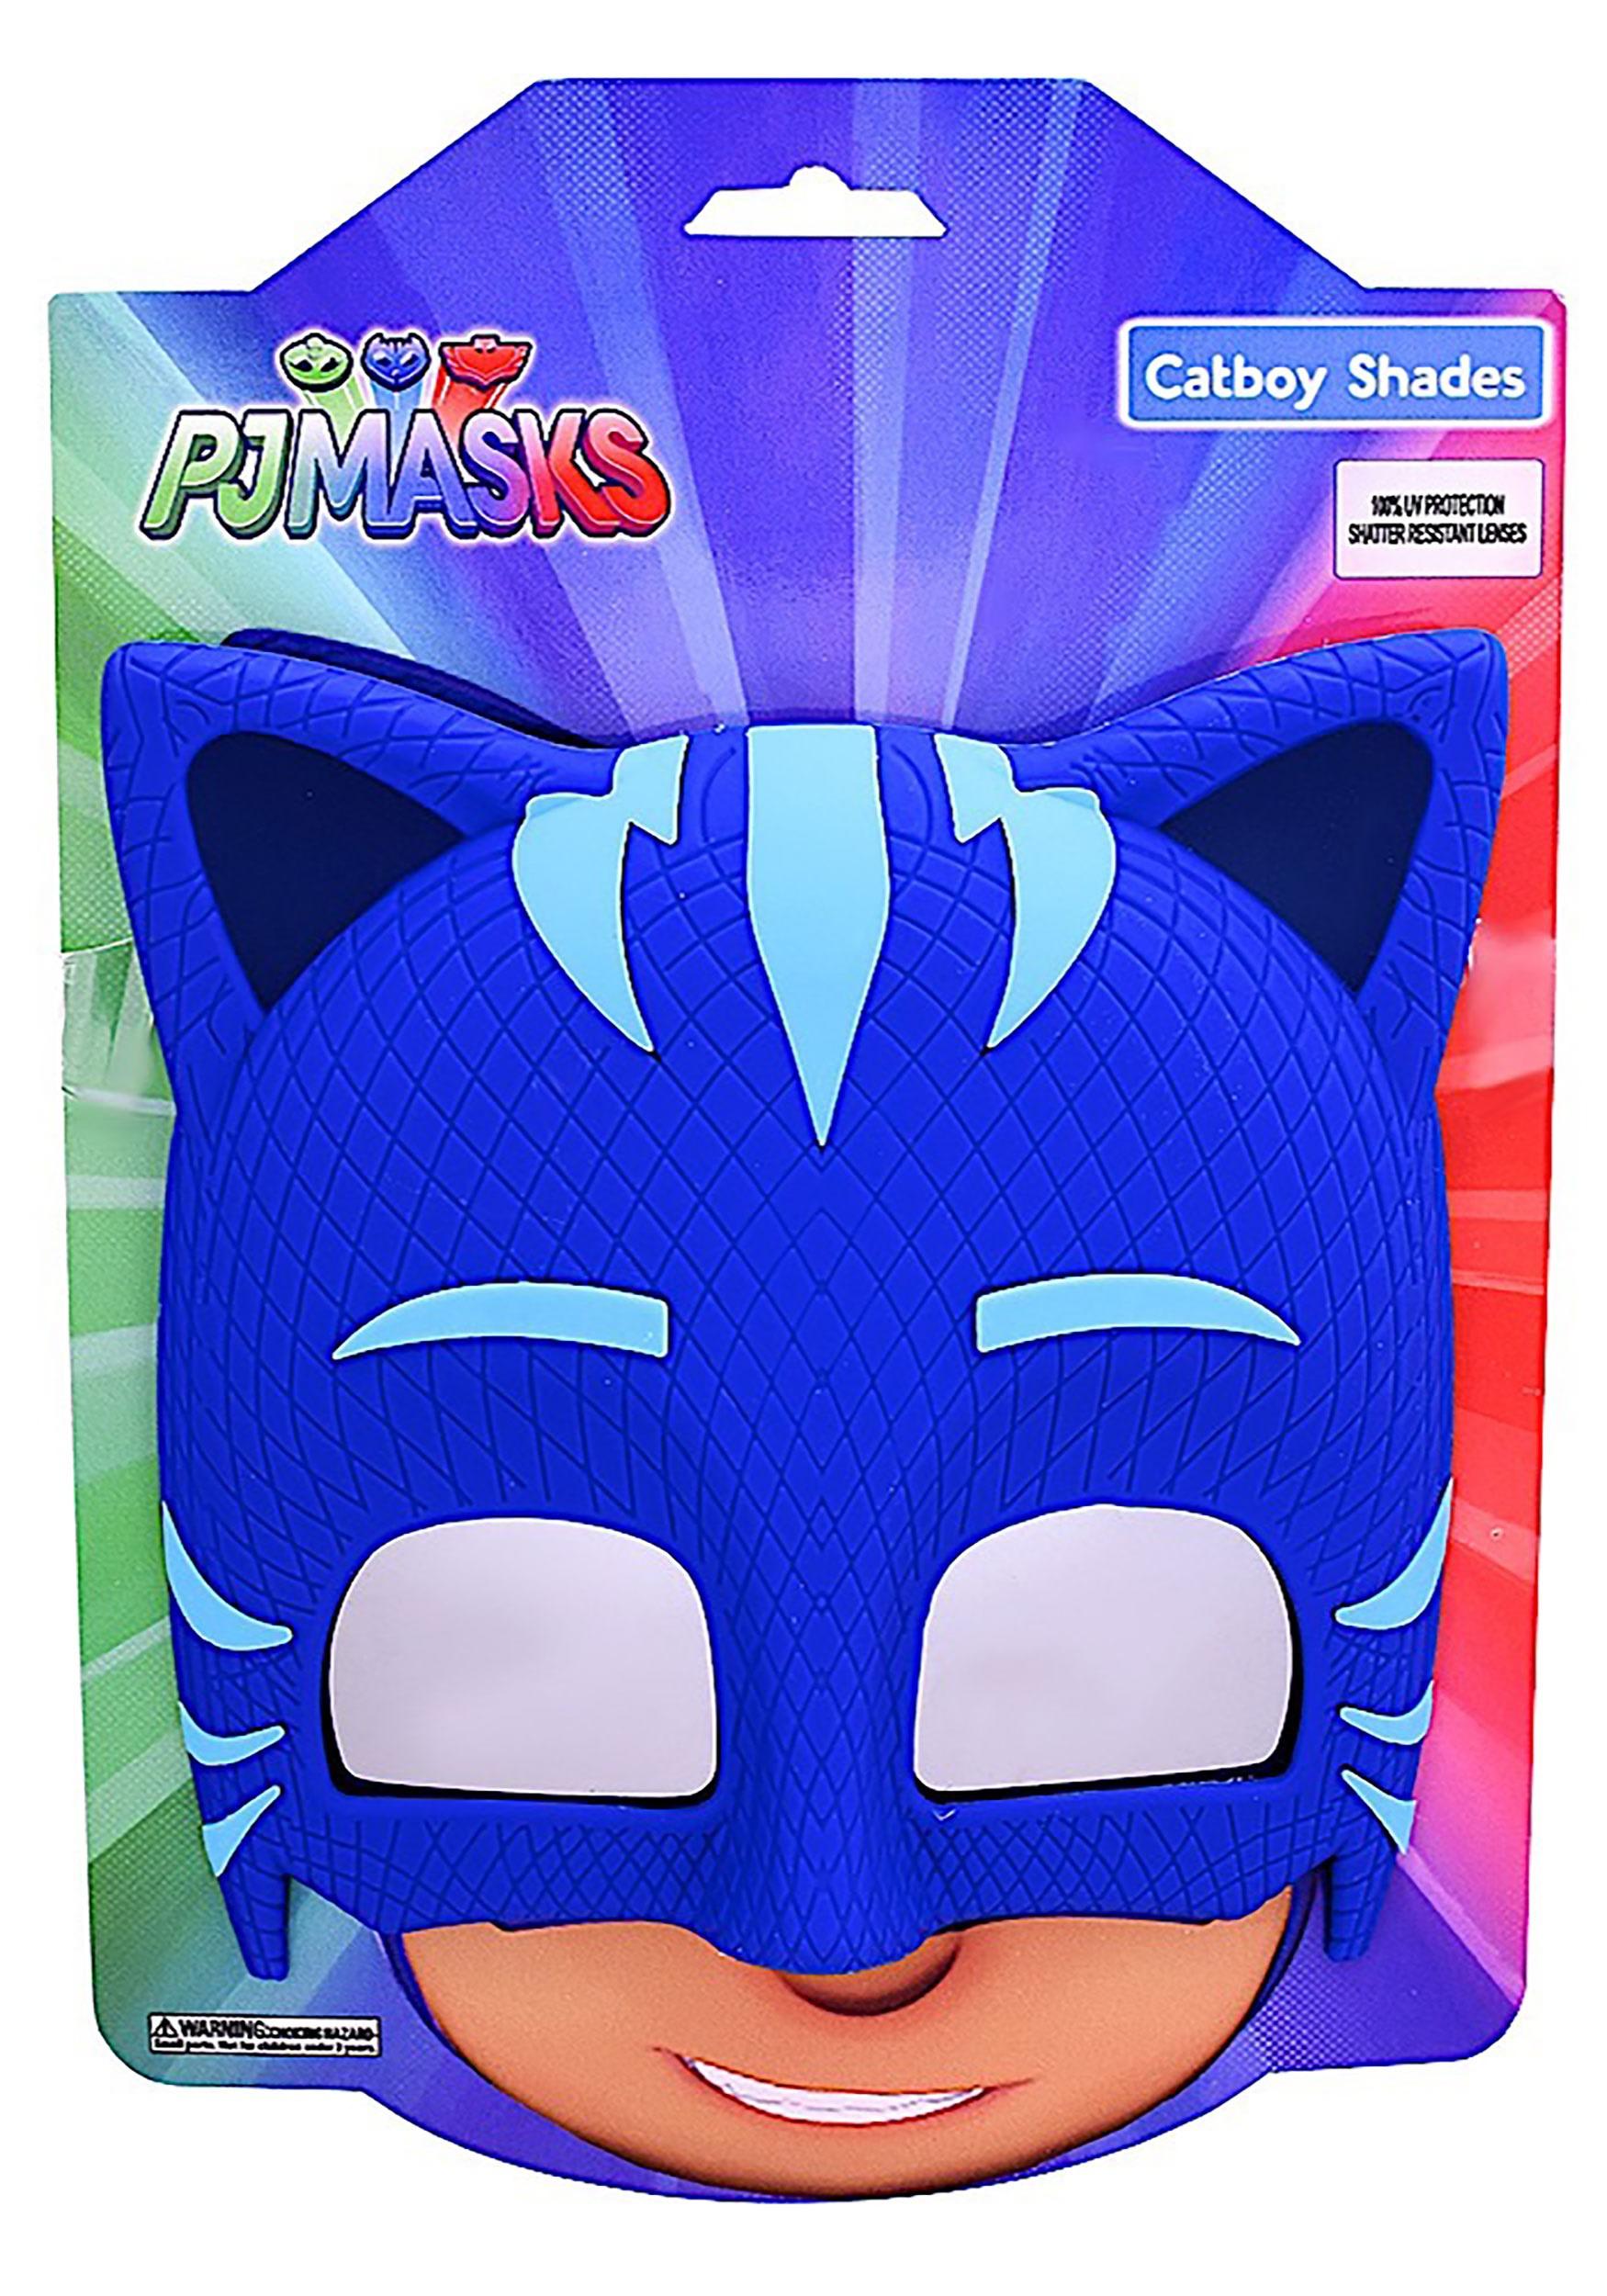 catboy sunglasses from pj masks